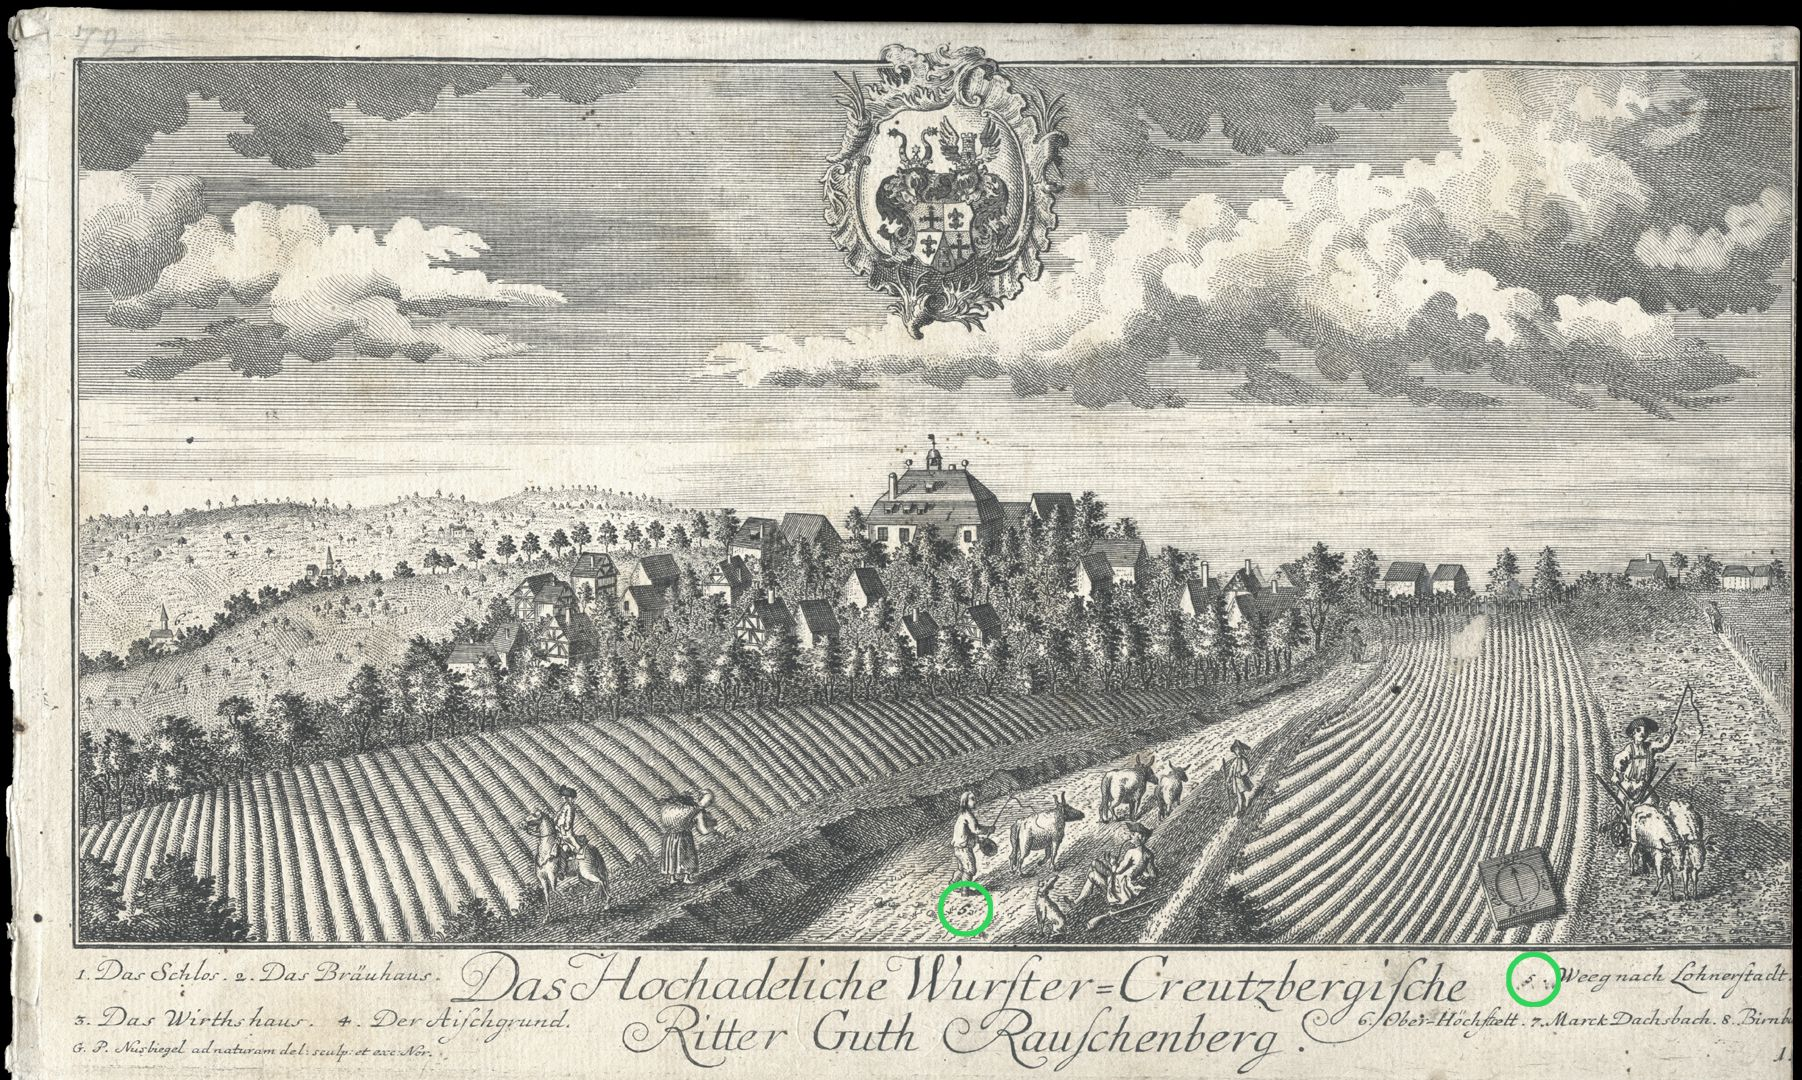 High-nobility-manor Rauschenberg of Wurster-Creutzberg Way to Lohnerstadt